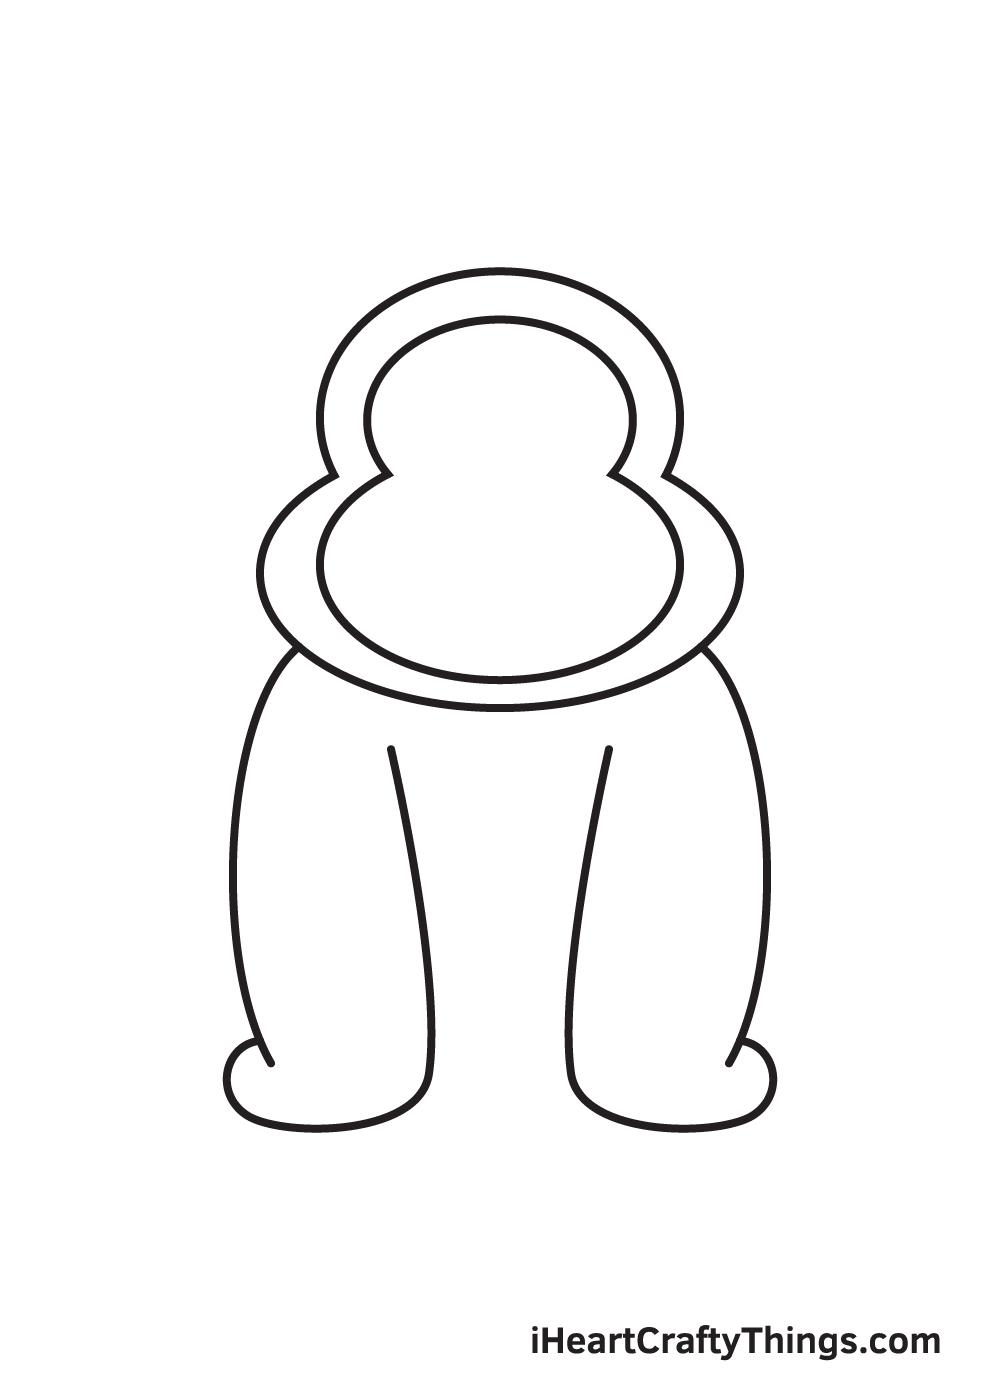 gorilla drawing - step 5